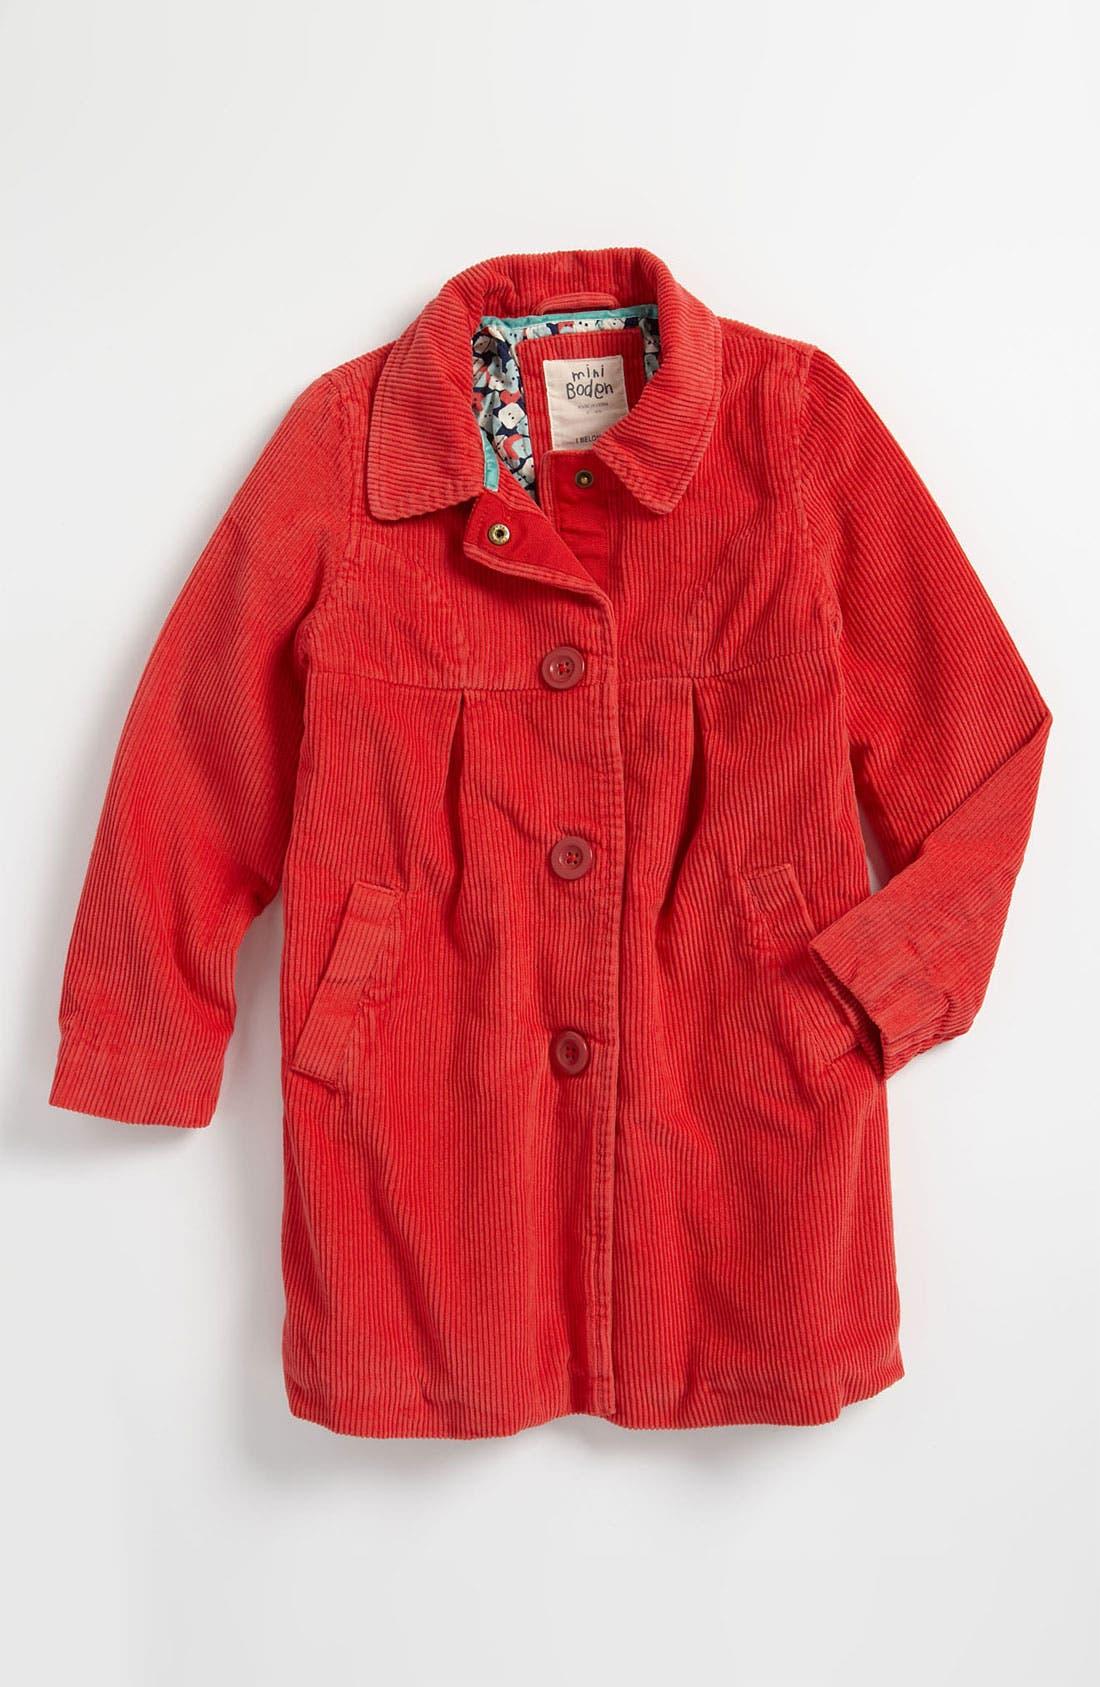 Alternate Image 1 Selected - Mini Boden 'Fun' Corduroy Coat (Toddler)